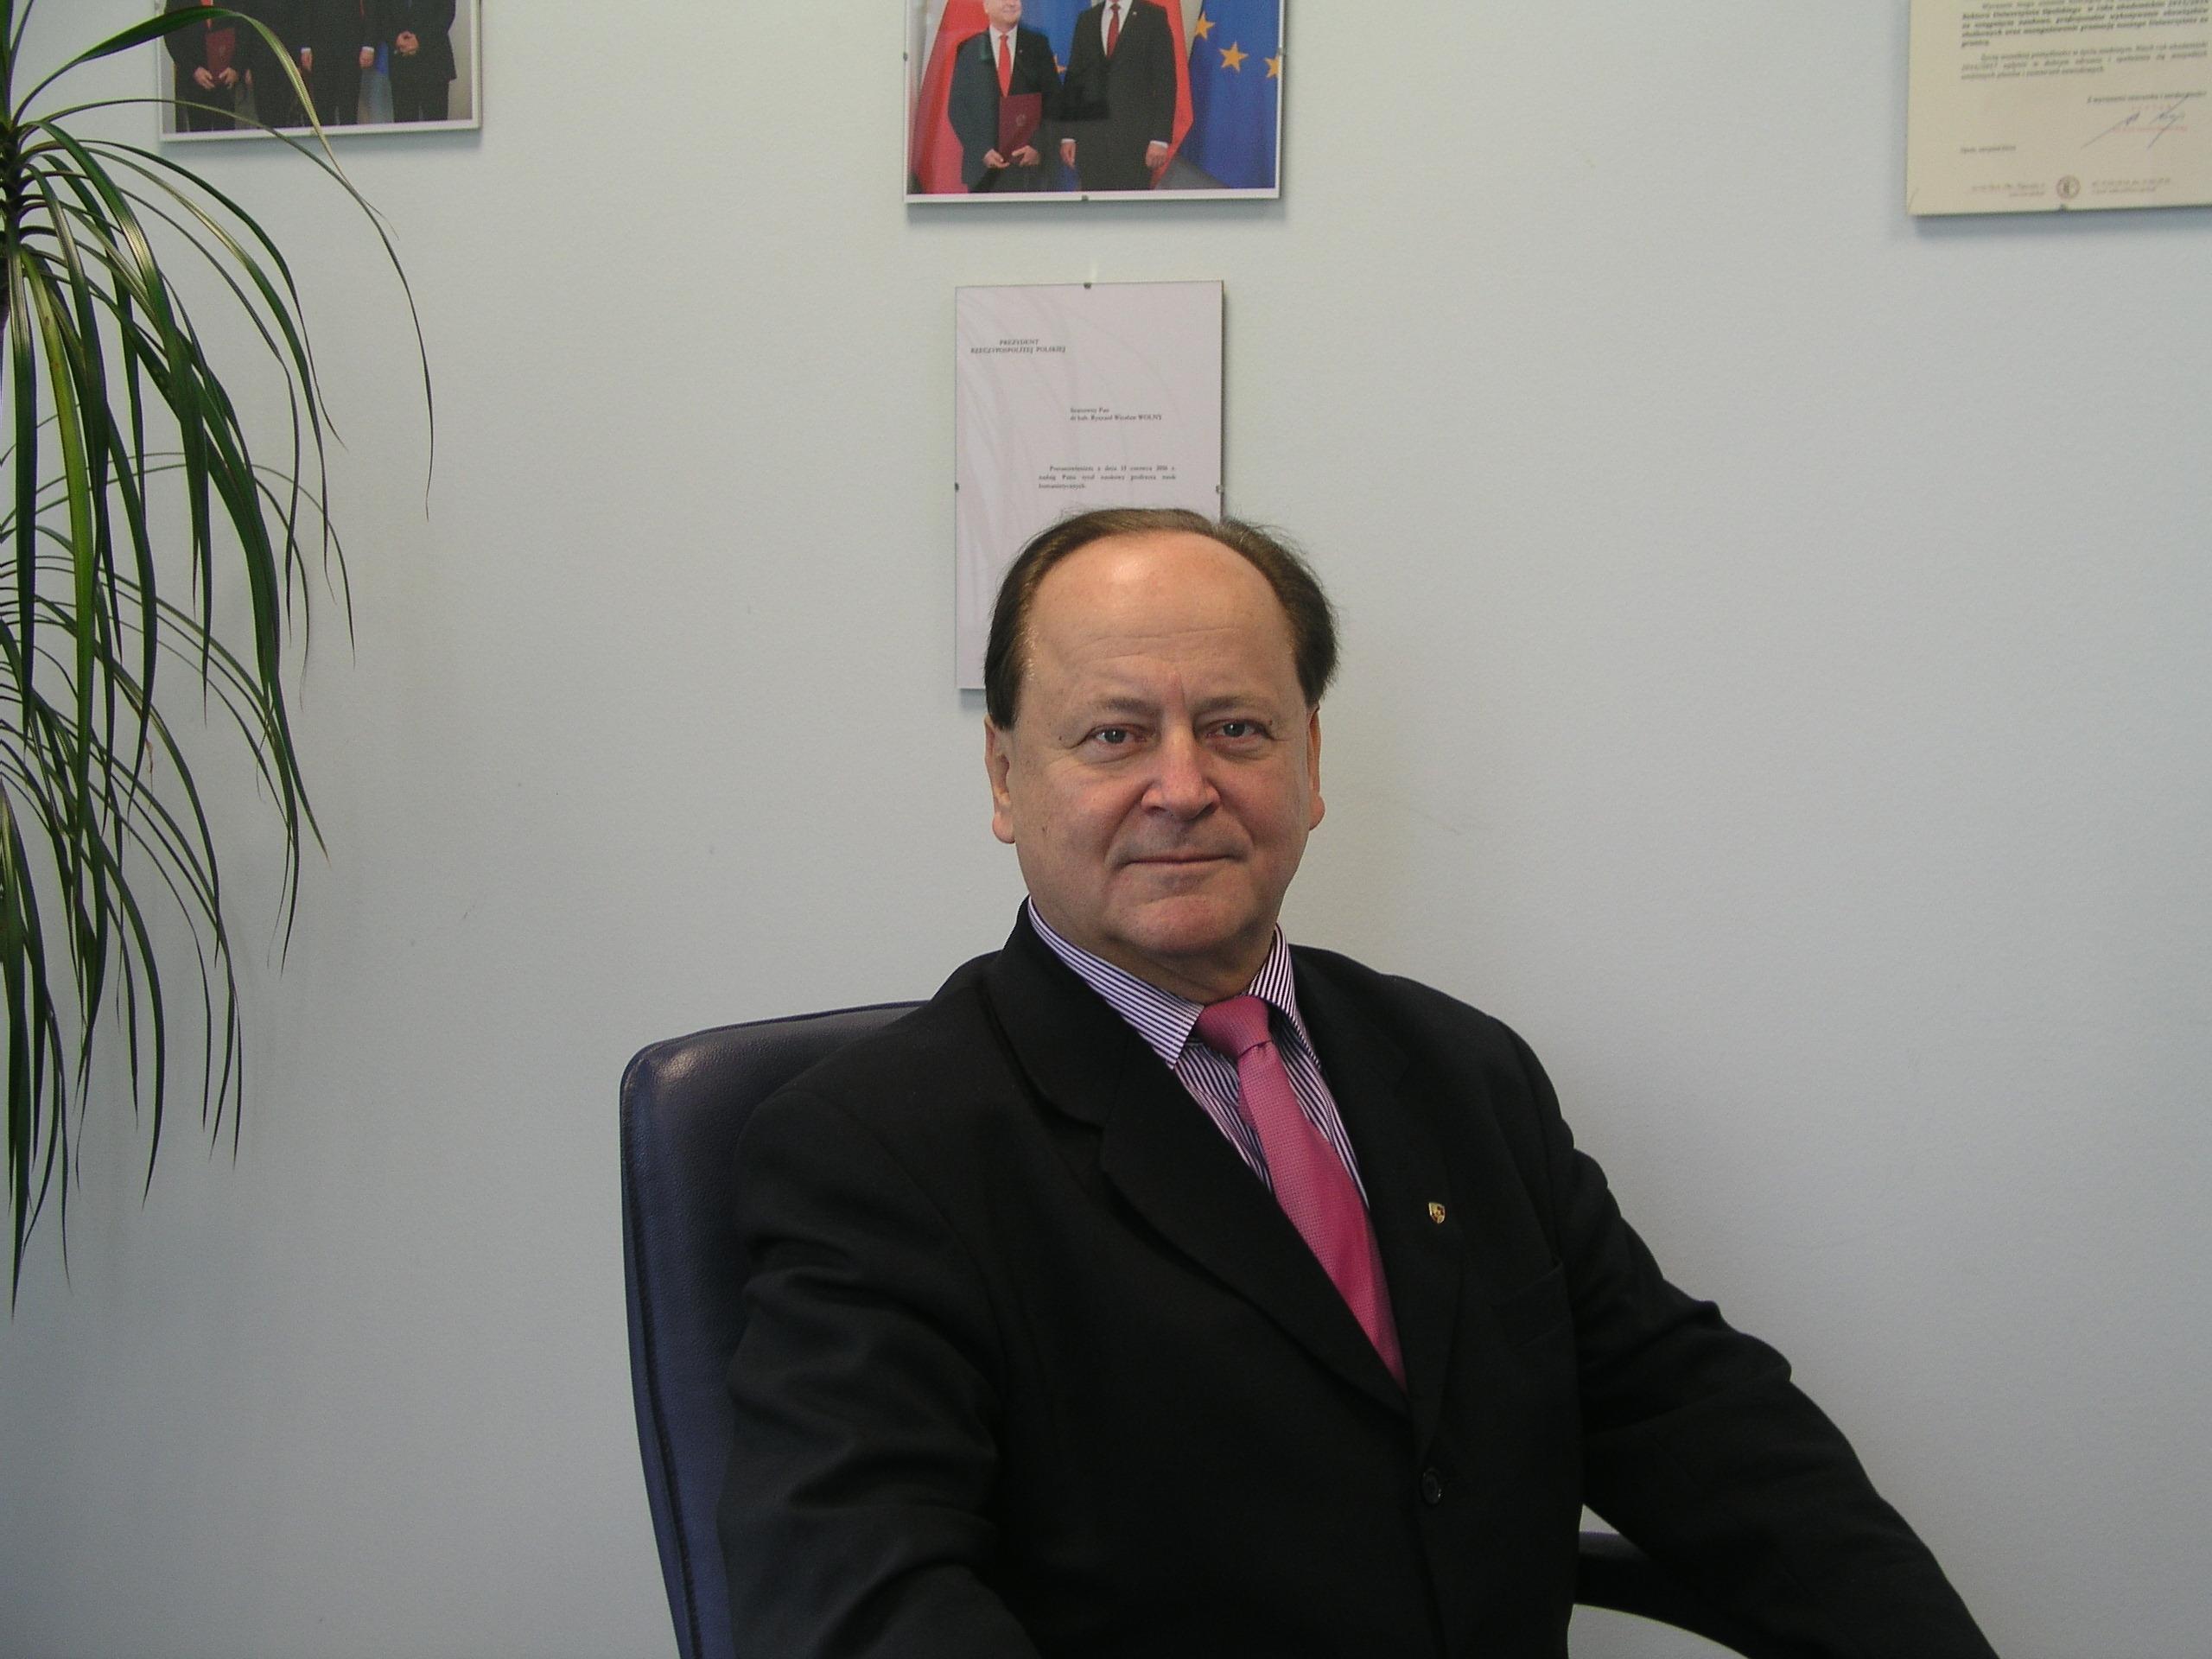 prof. dr hab. Ryszard Wolny